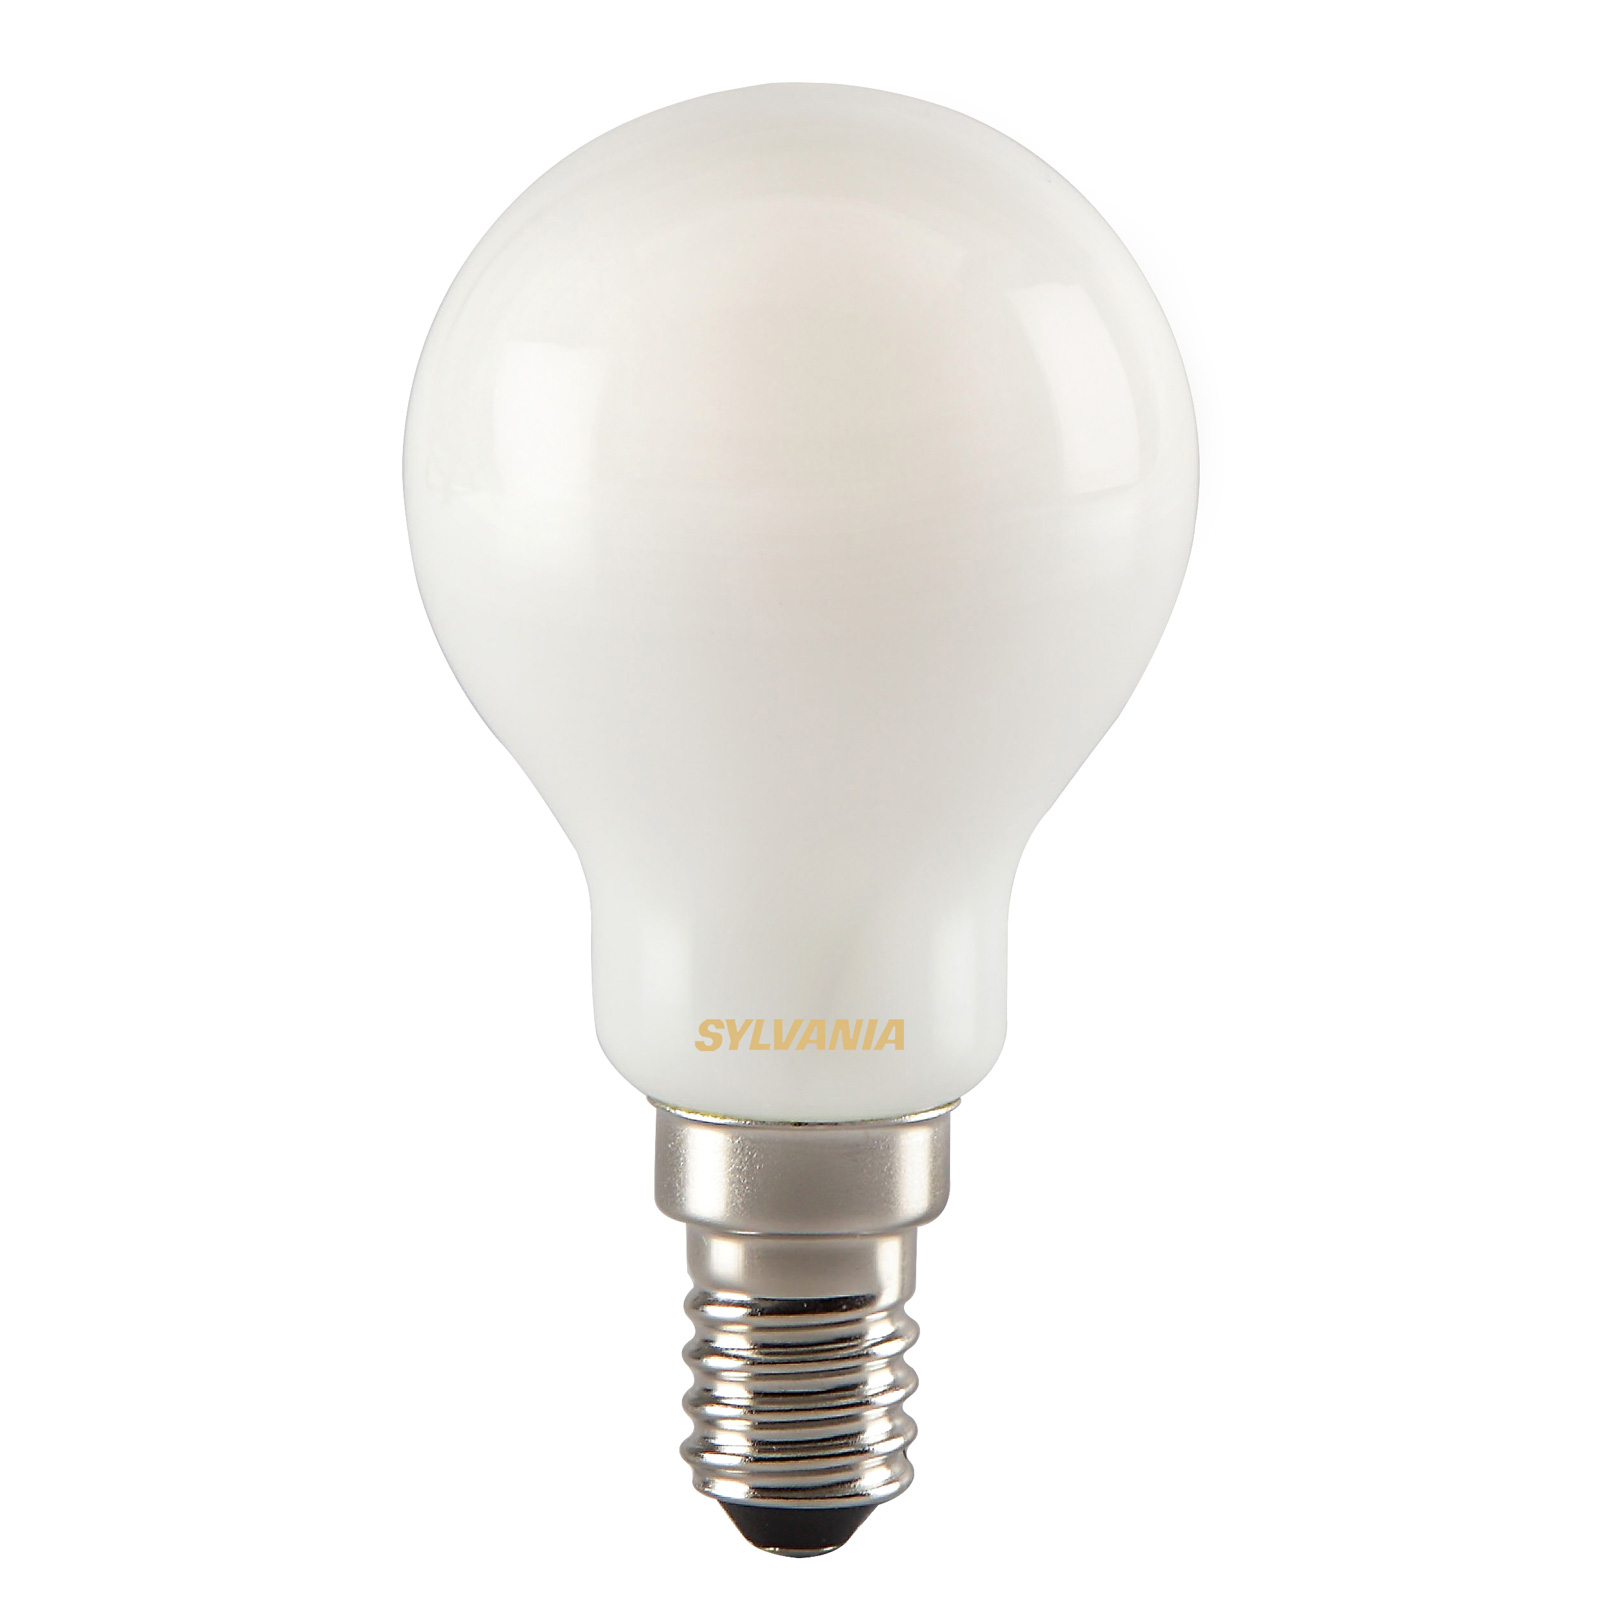 LED-Tropfenlampe E14 ToLEDo RT Ball 4,5W 827 satin